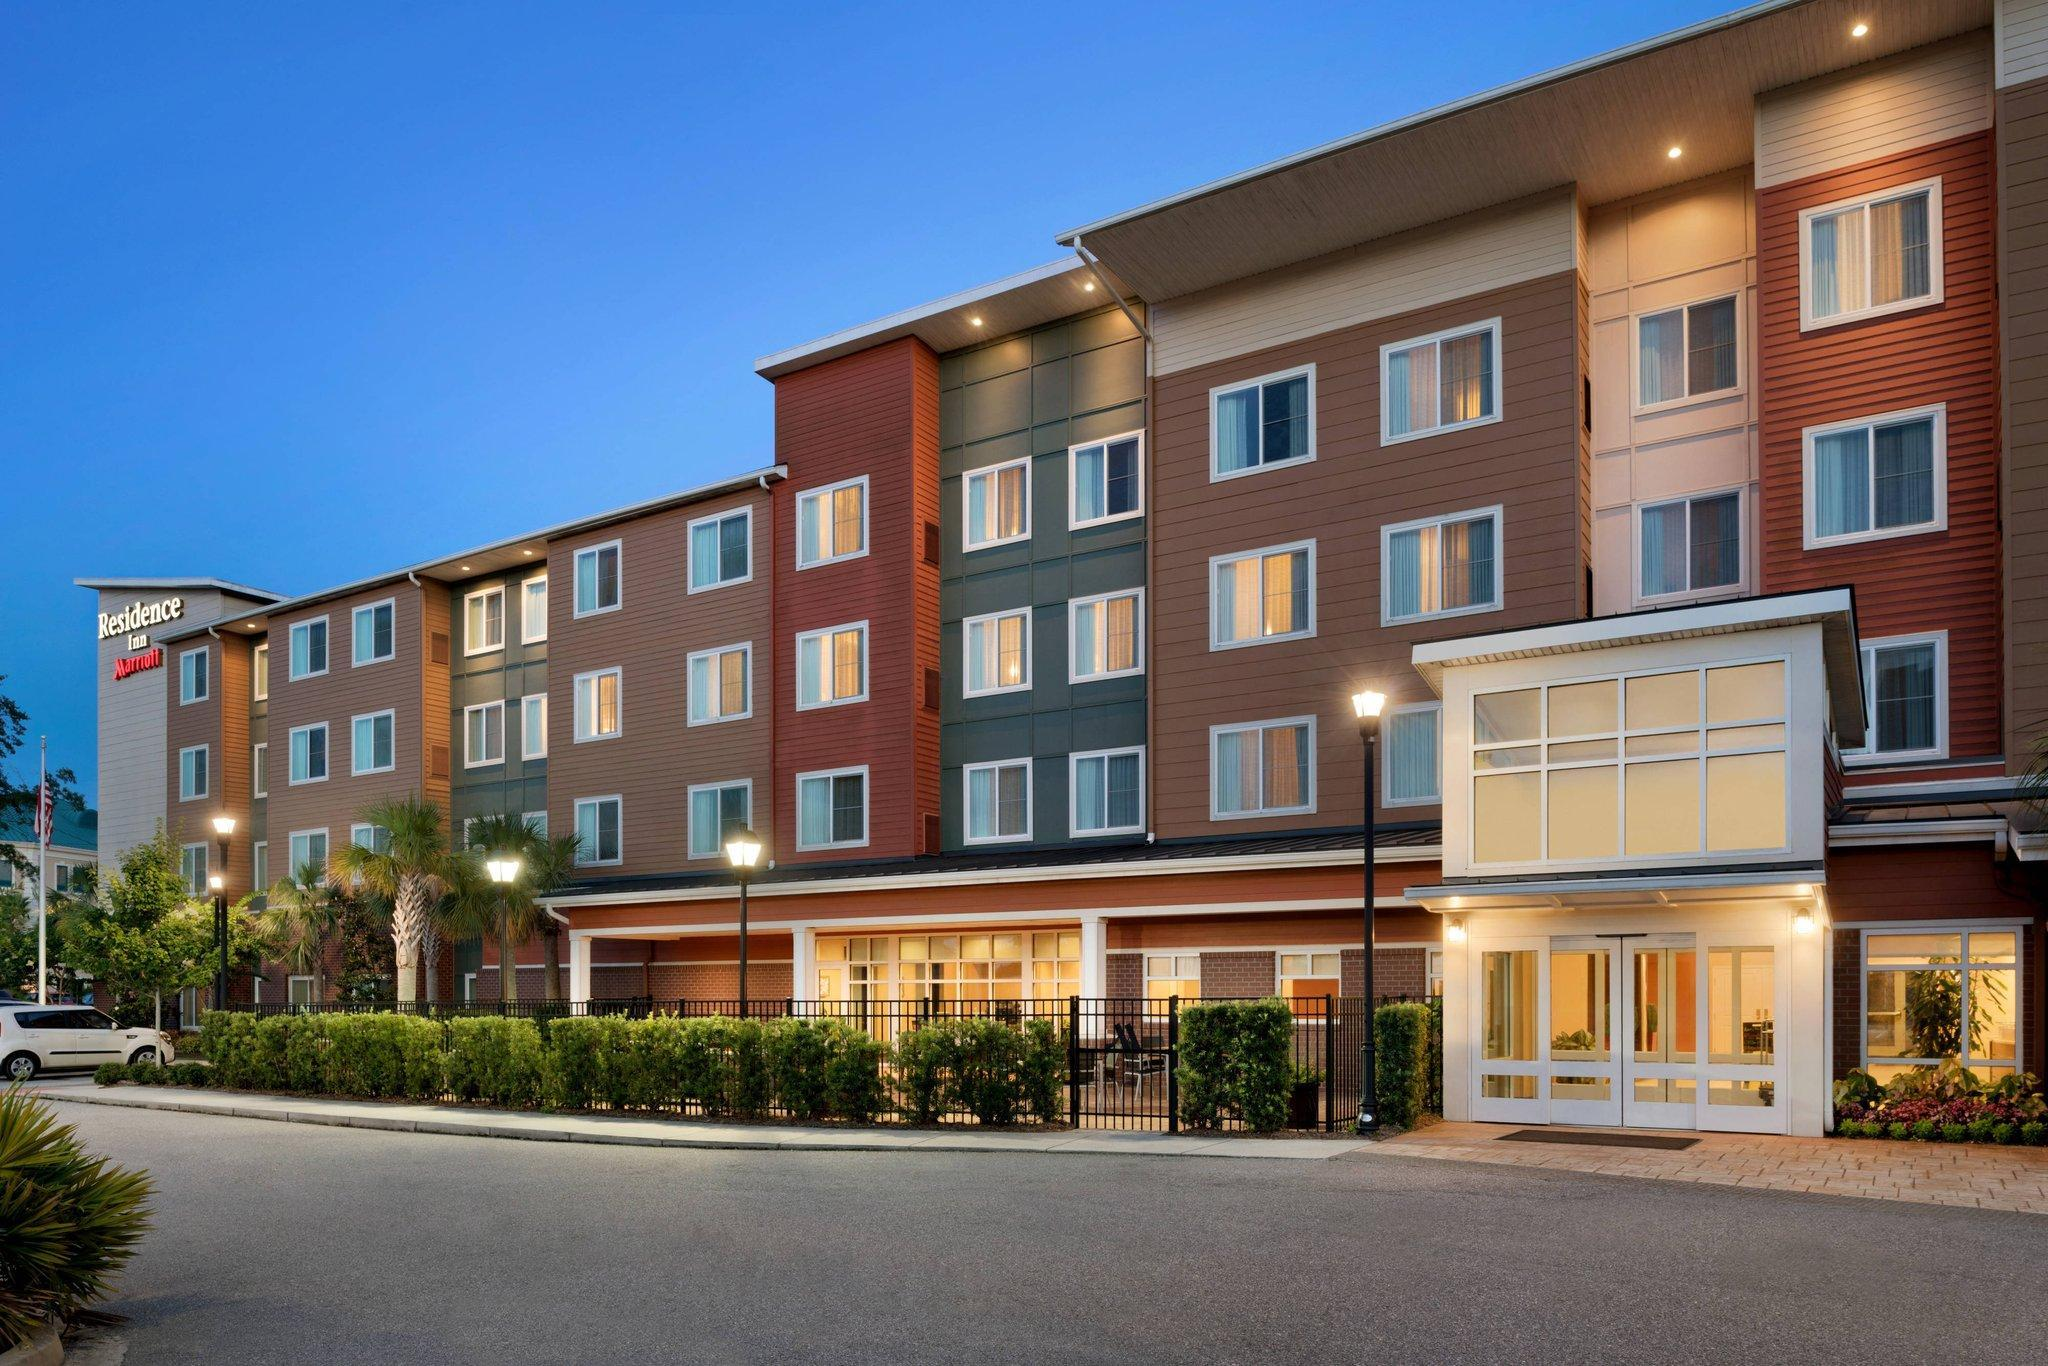 Residence Inn Charleston North Ashley Phosphate